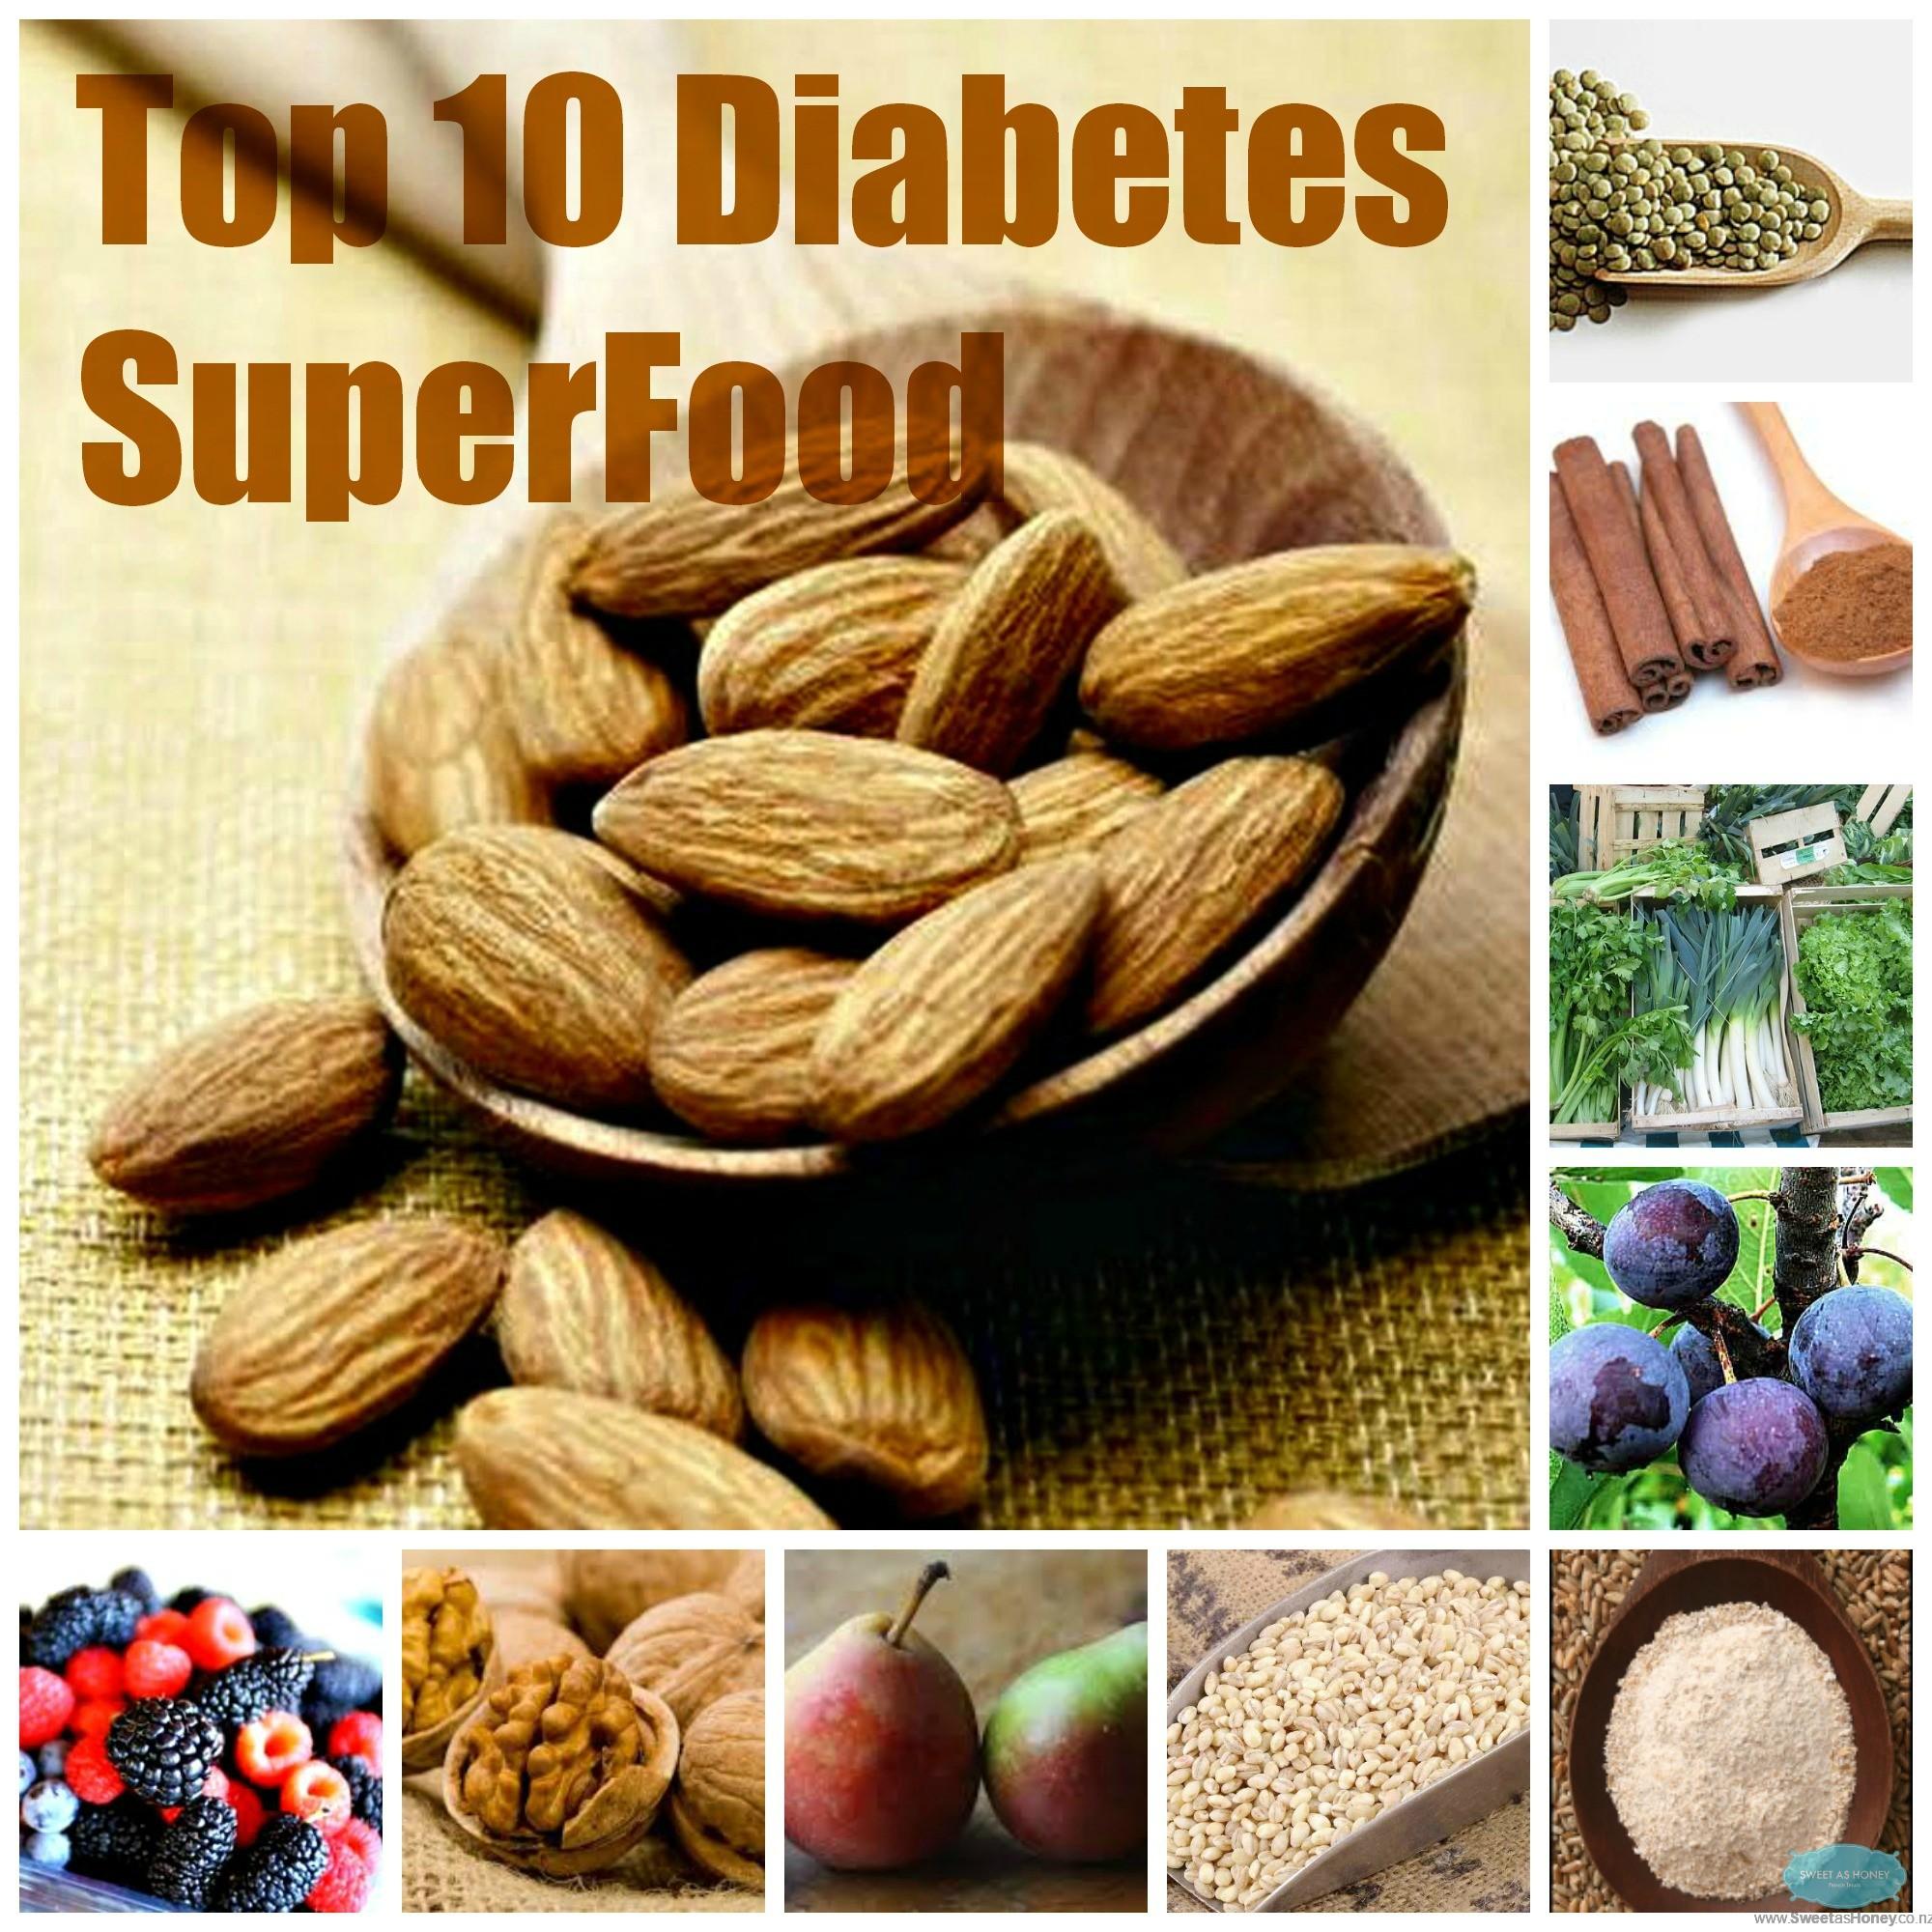 Sugar Free Food Recipes For Diabetics